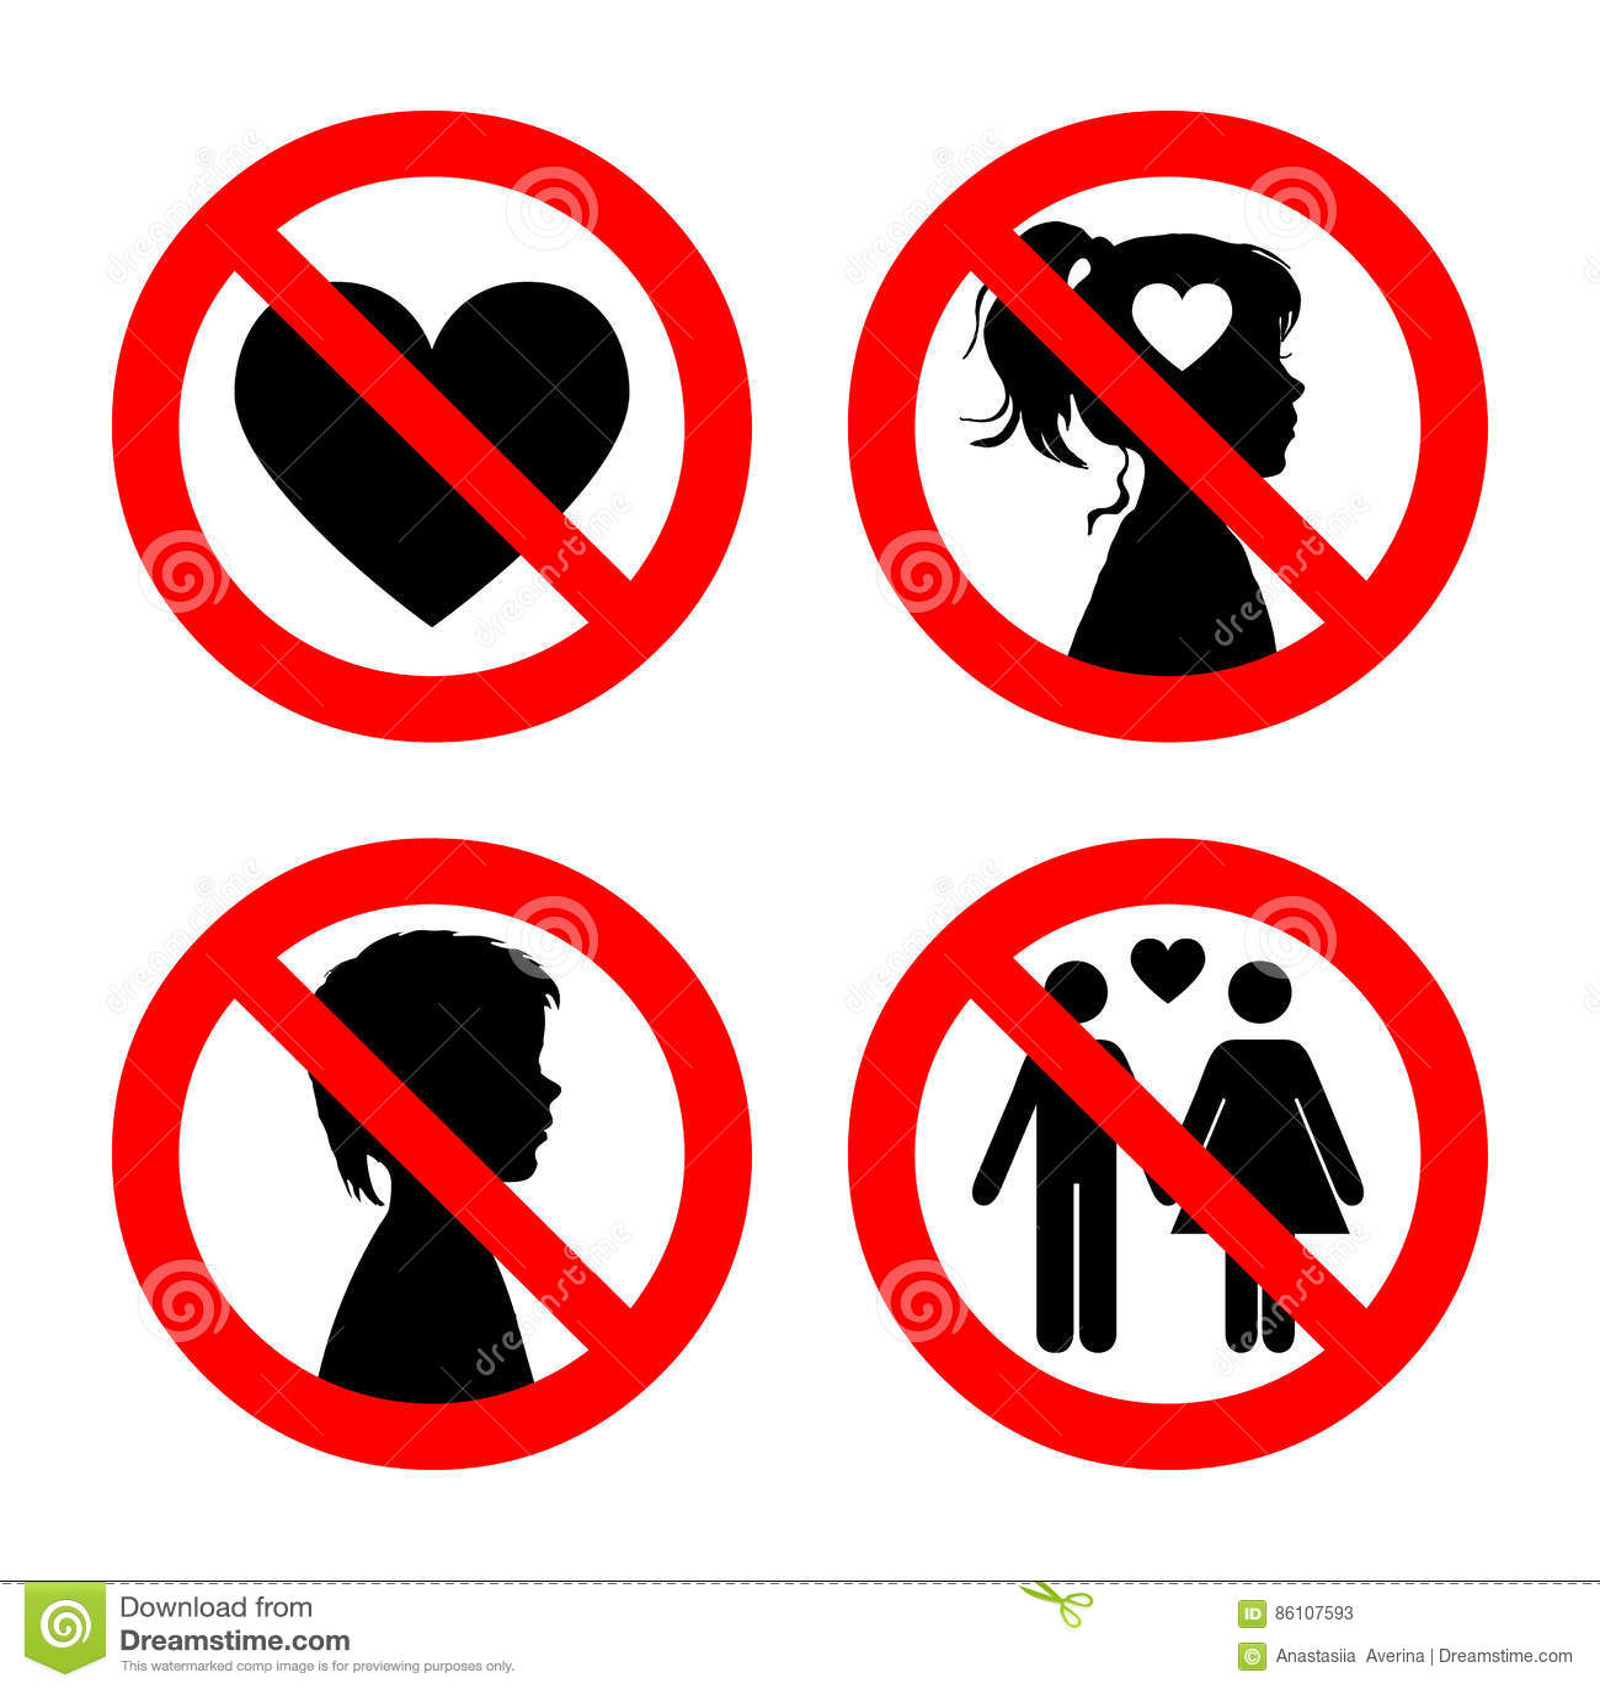 Prohibition sign icons collection set of vector illustration on prohibition sign icons collection set of vector illustration on white red forbidden circle no love no girls buycottarizona